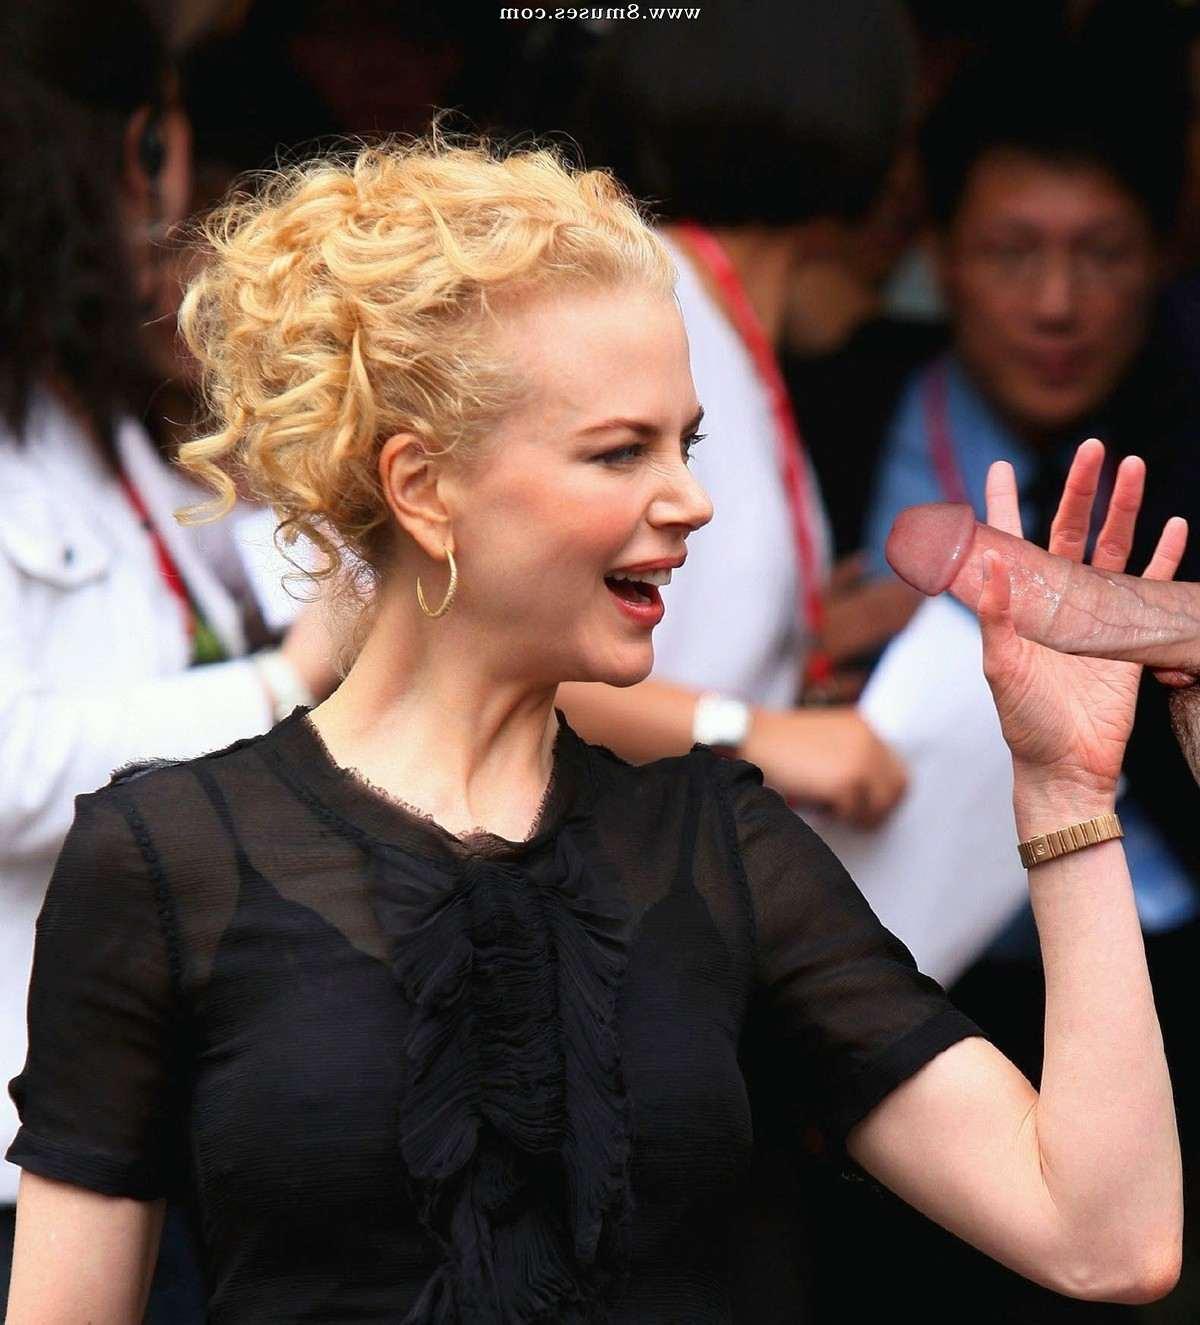 Fake-Celebrities-Sex-Pictures/Nicole-Kidman Nicole_Kidman__8muses_-_Sex_and_Porn_Comics_576.jpg